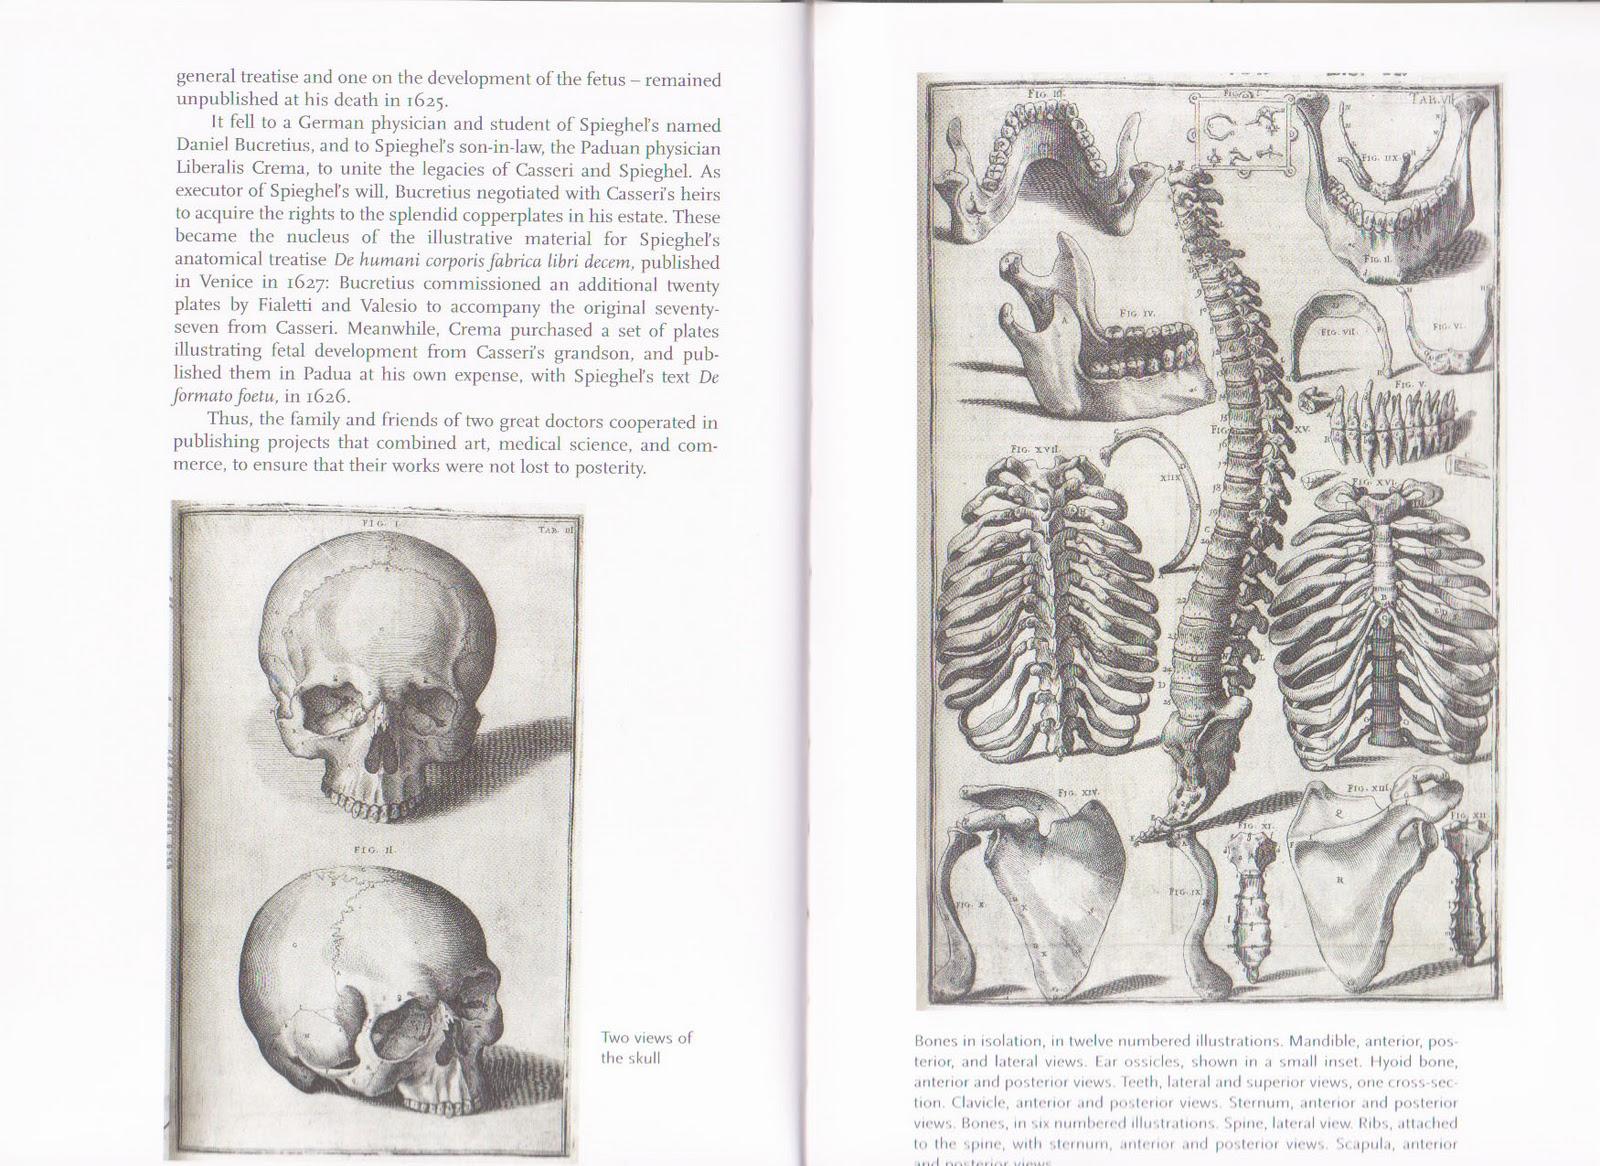 http://1.bp.blogspot.com/-Azk7j-s_k8s/TVg2XkMpHdI/AAAAAAAAAL0/haTg23pFB6k/s1600/Human+Anatomy.5.jpg